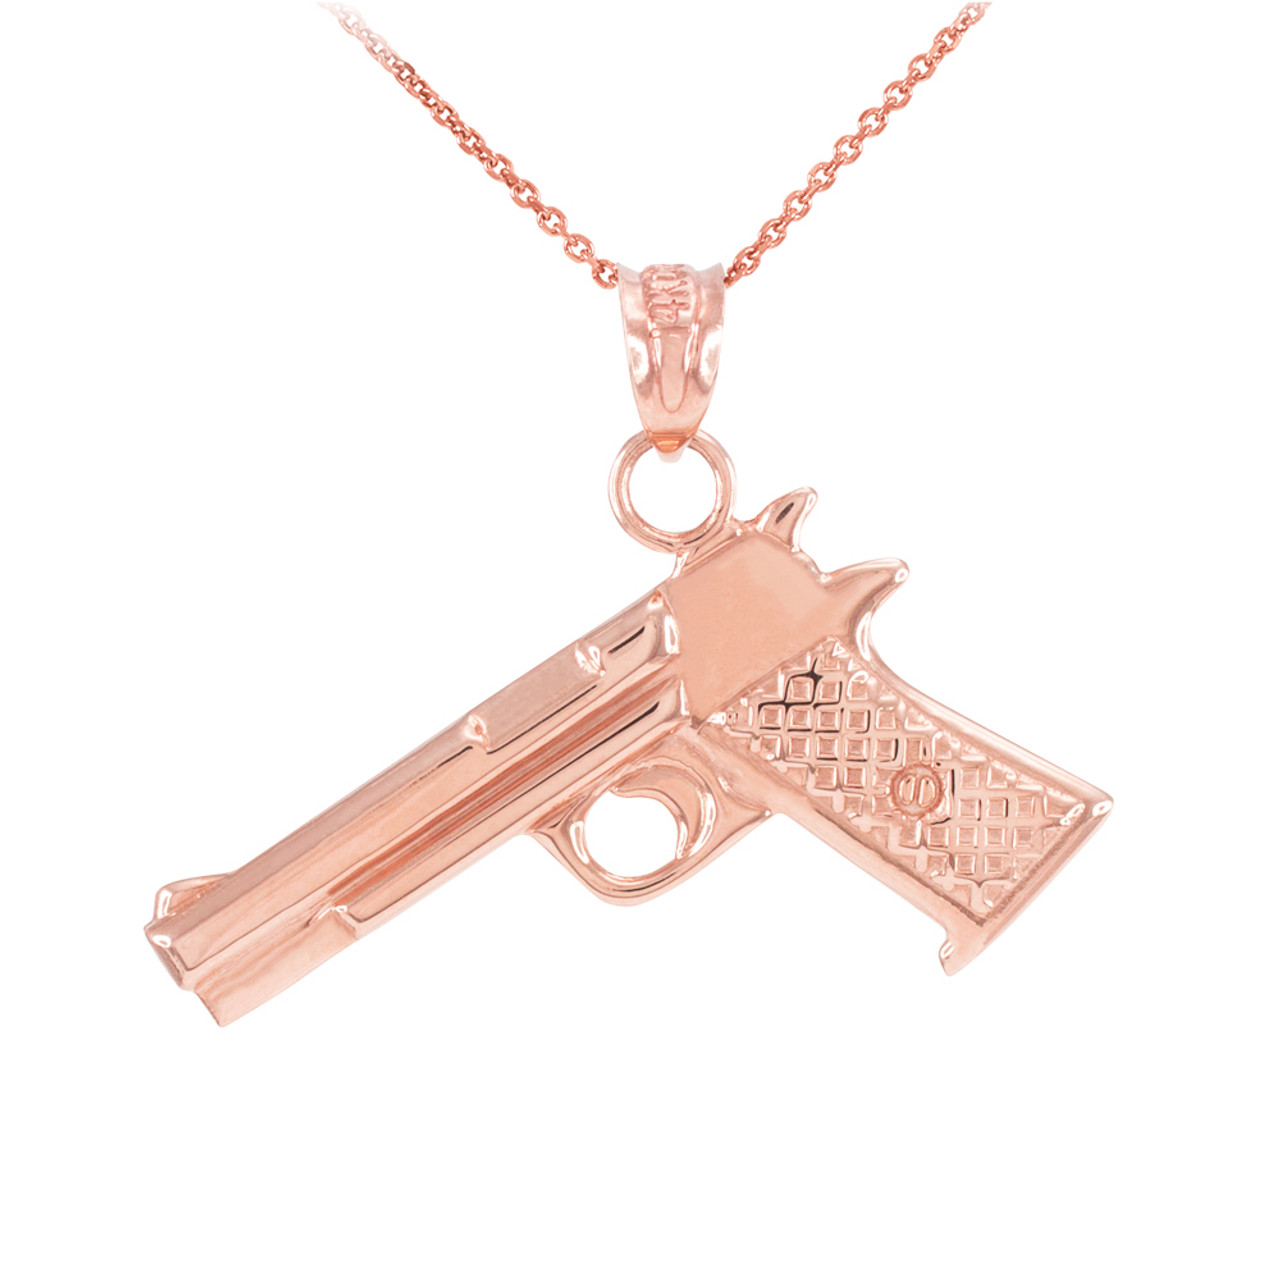 Solid Rose Gold Desert Eagle Pistol Gun Pendant Necklace